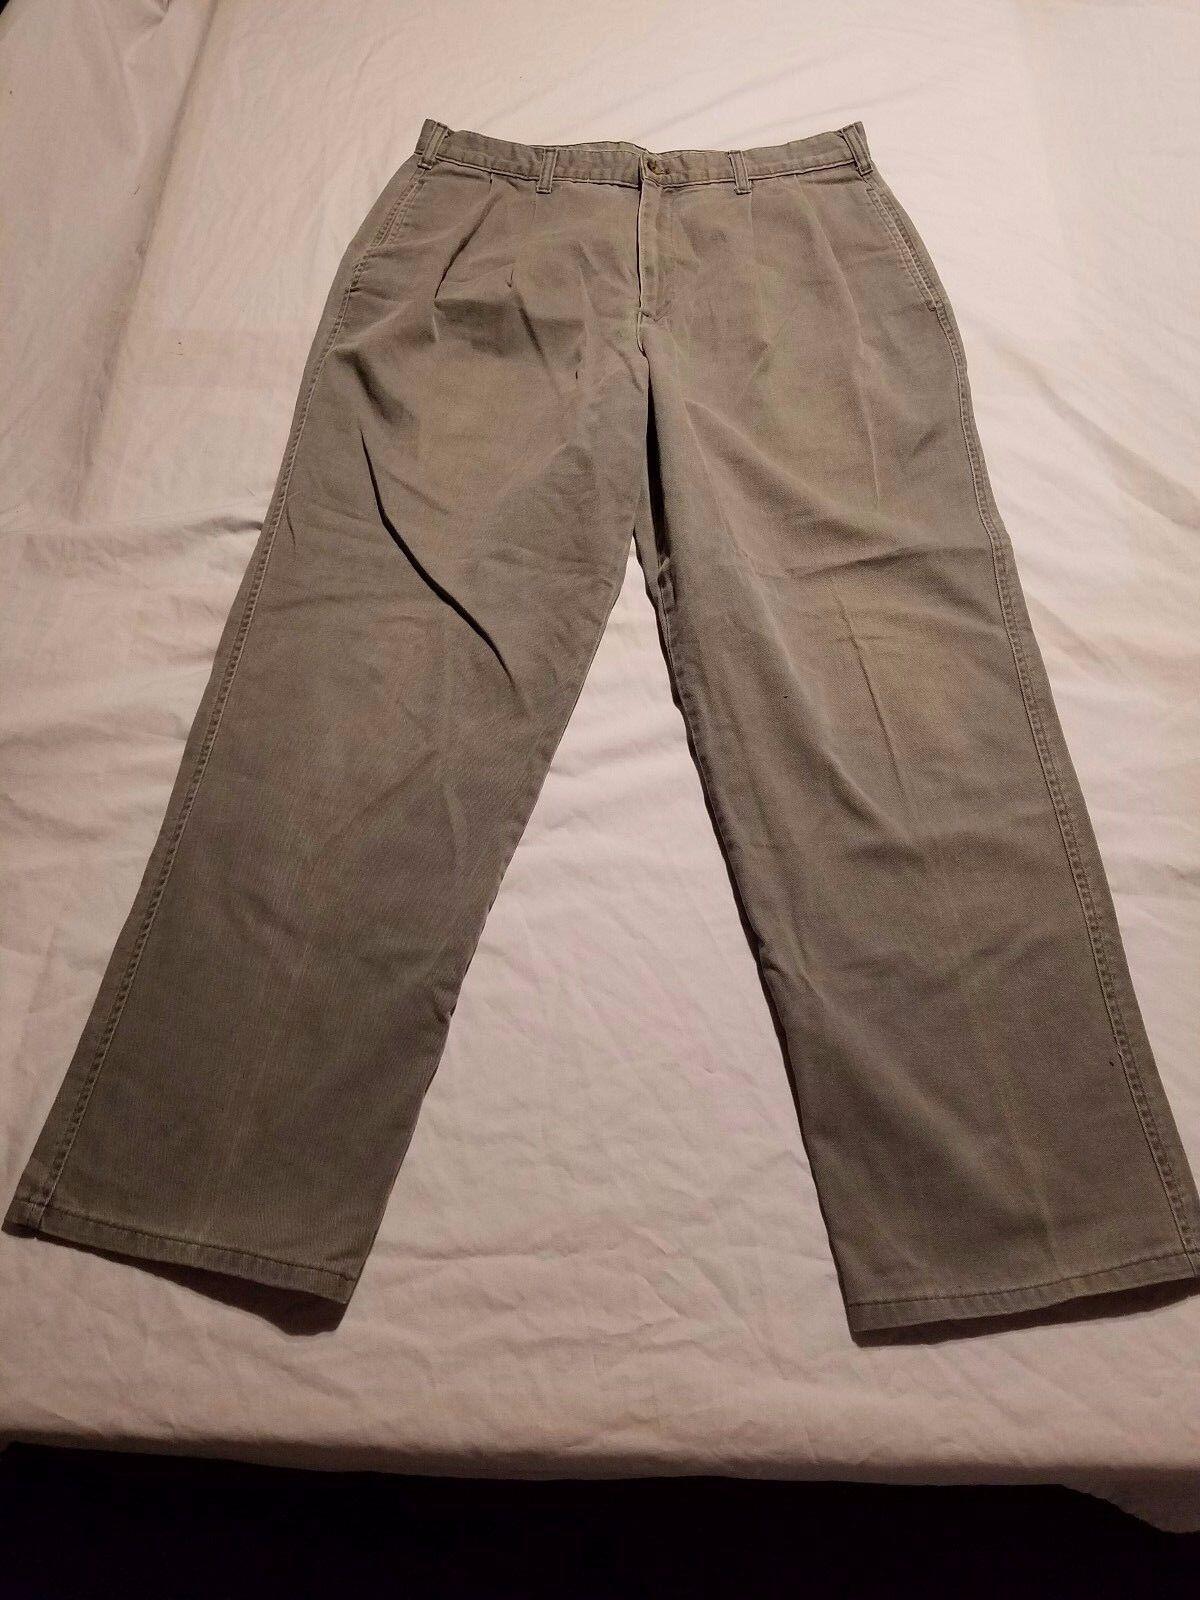 Vintage Brooks Bredhers Men's pants Size 34x30